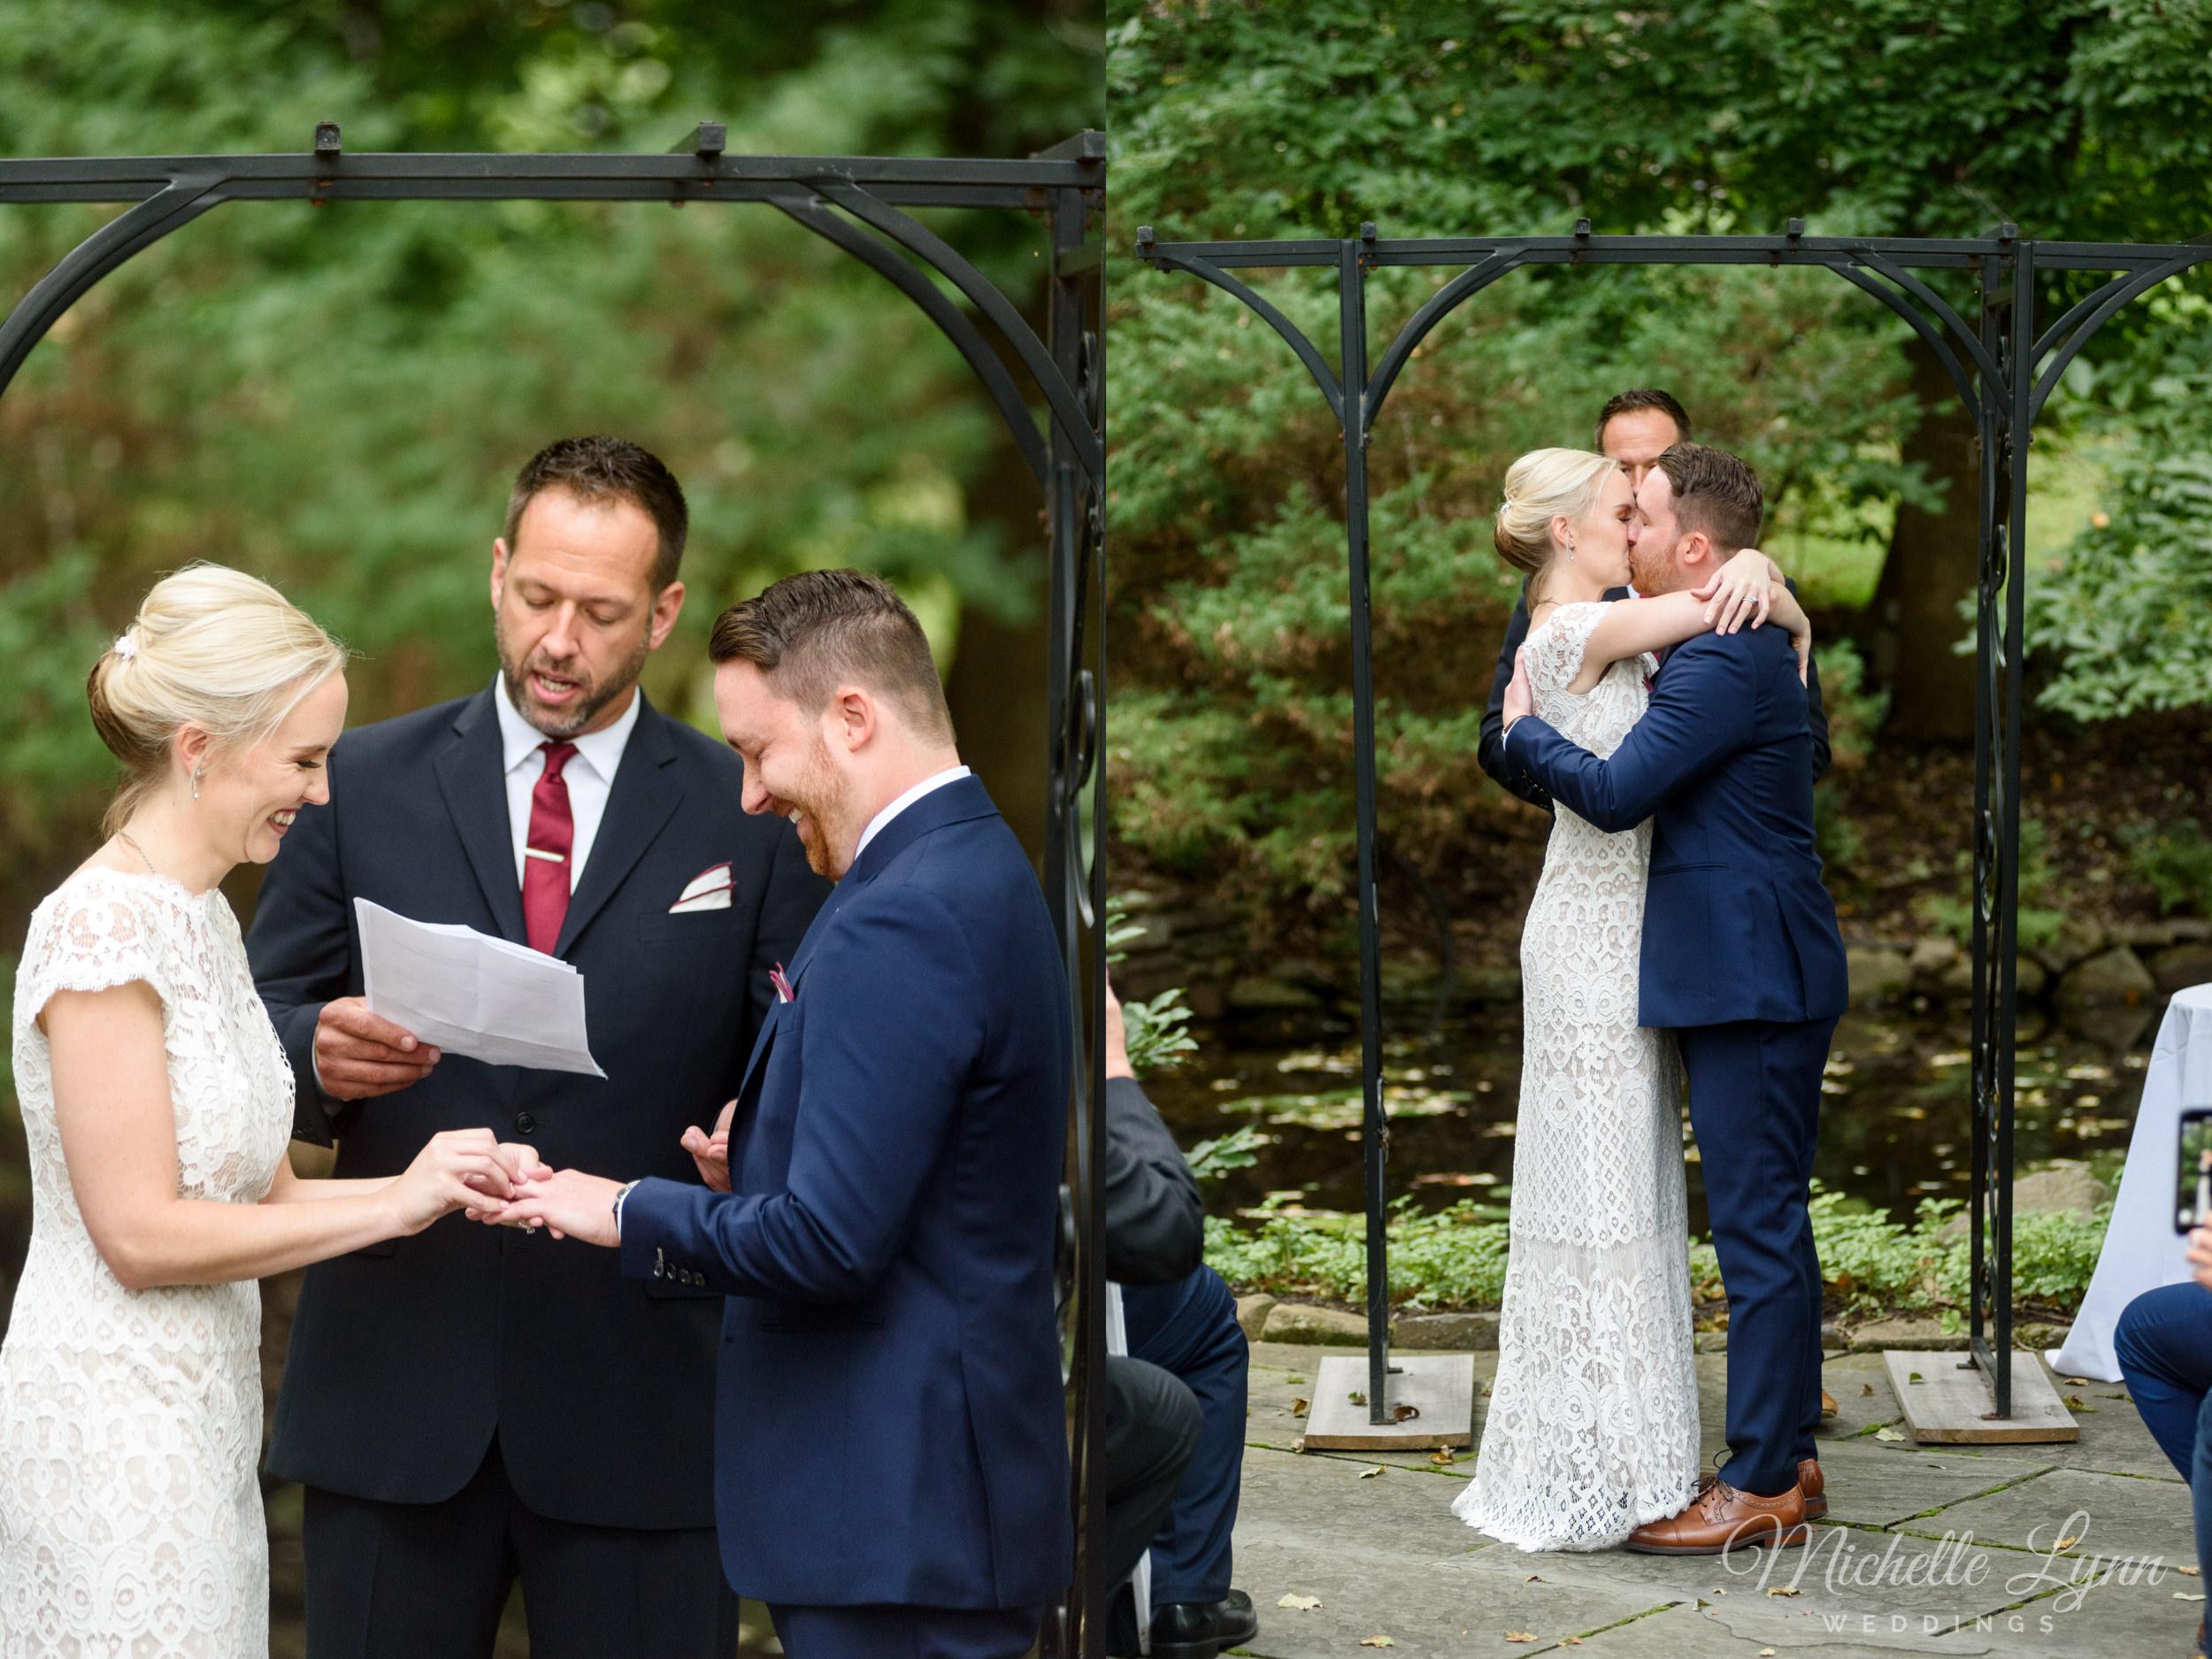 mlw-lumberville-general-store-new-hope-wedding-photographer-49.jpg